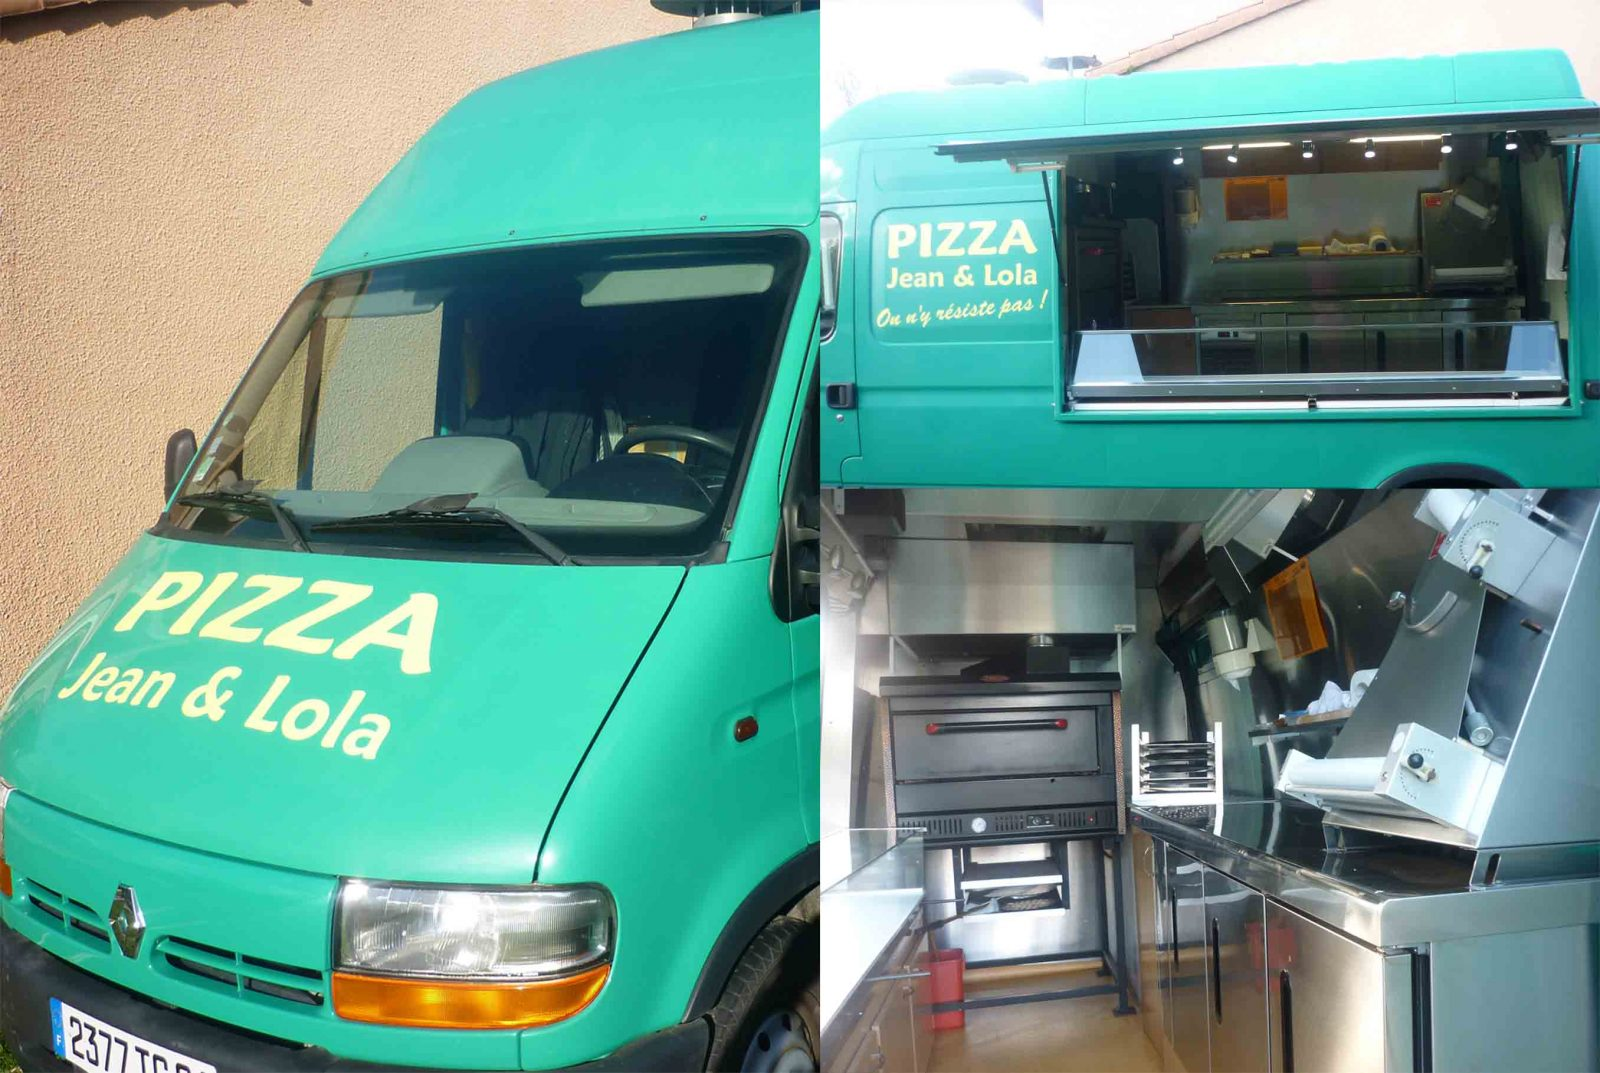 Jean & Lola – Pizzéria Food Truck